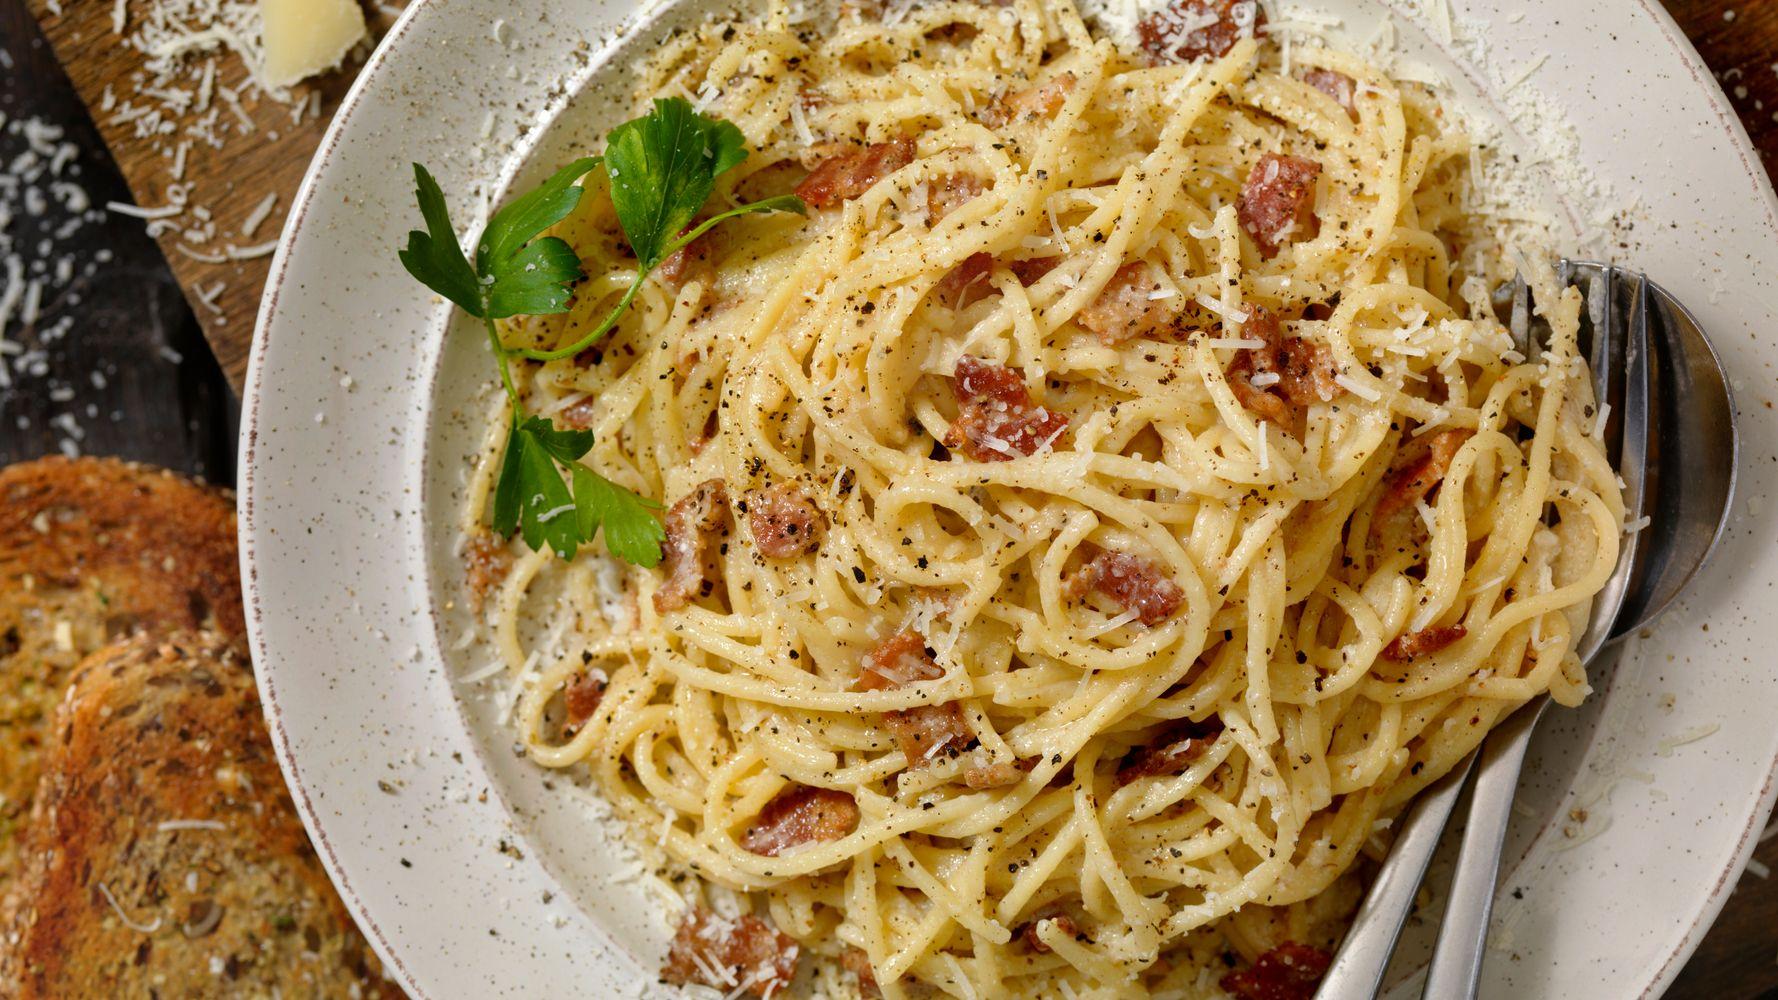 Try This Tasty 10-Minute Carbonara Recipe From Gordon Ramsay